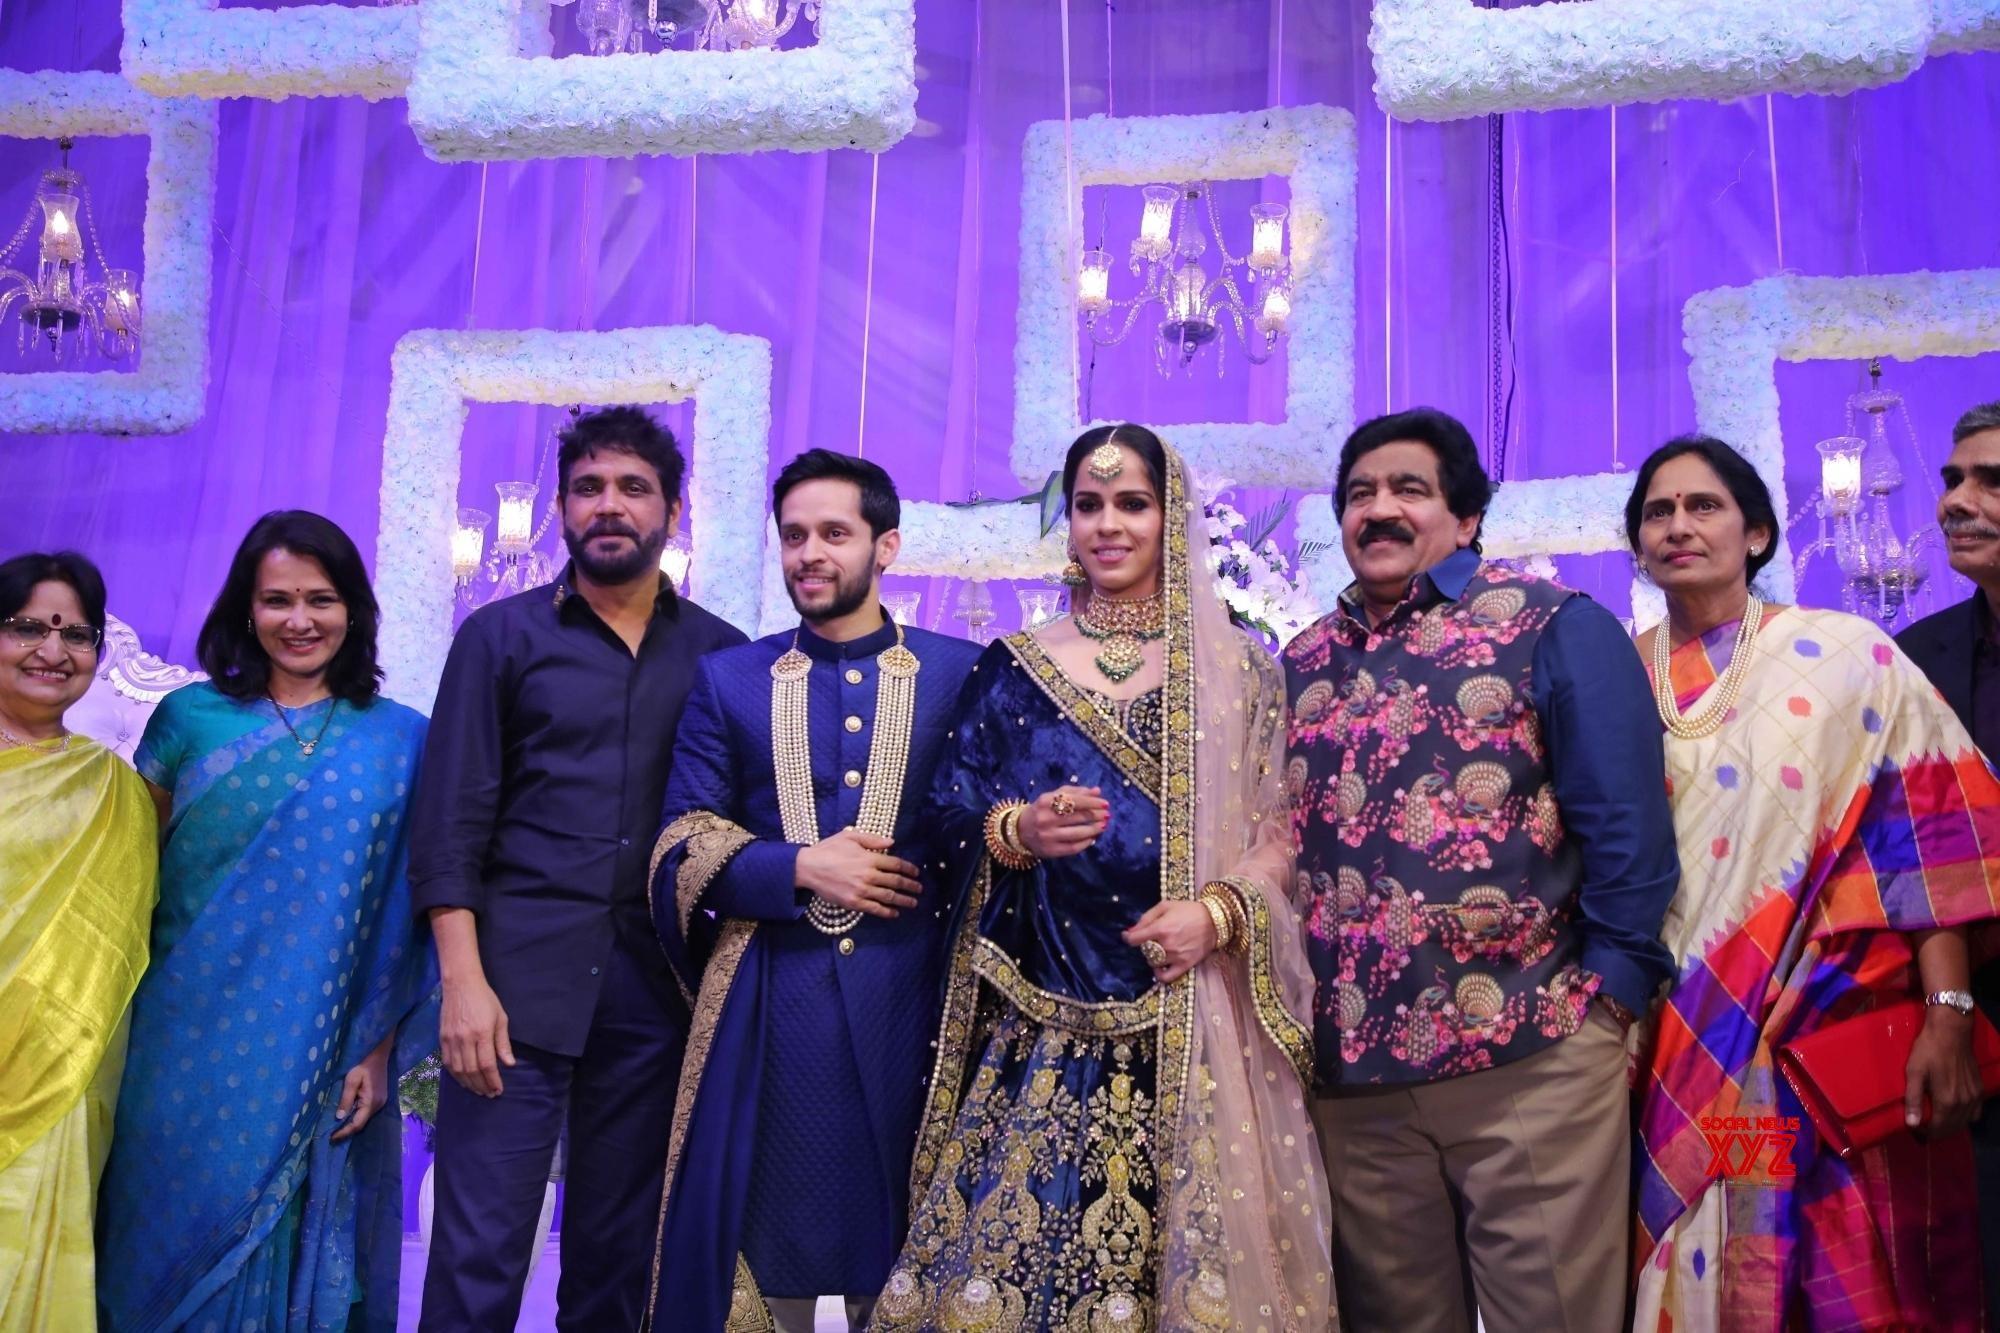 Hyderabad: - Wedding reception of Saina Nehwal and Parupalli Kashyap #Gallery